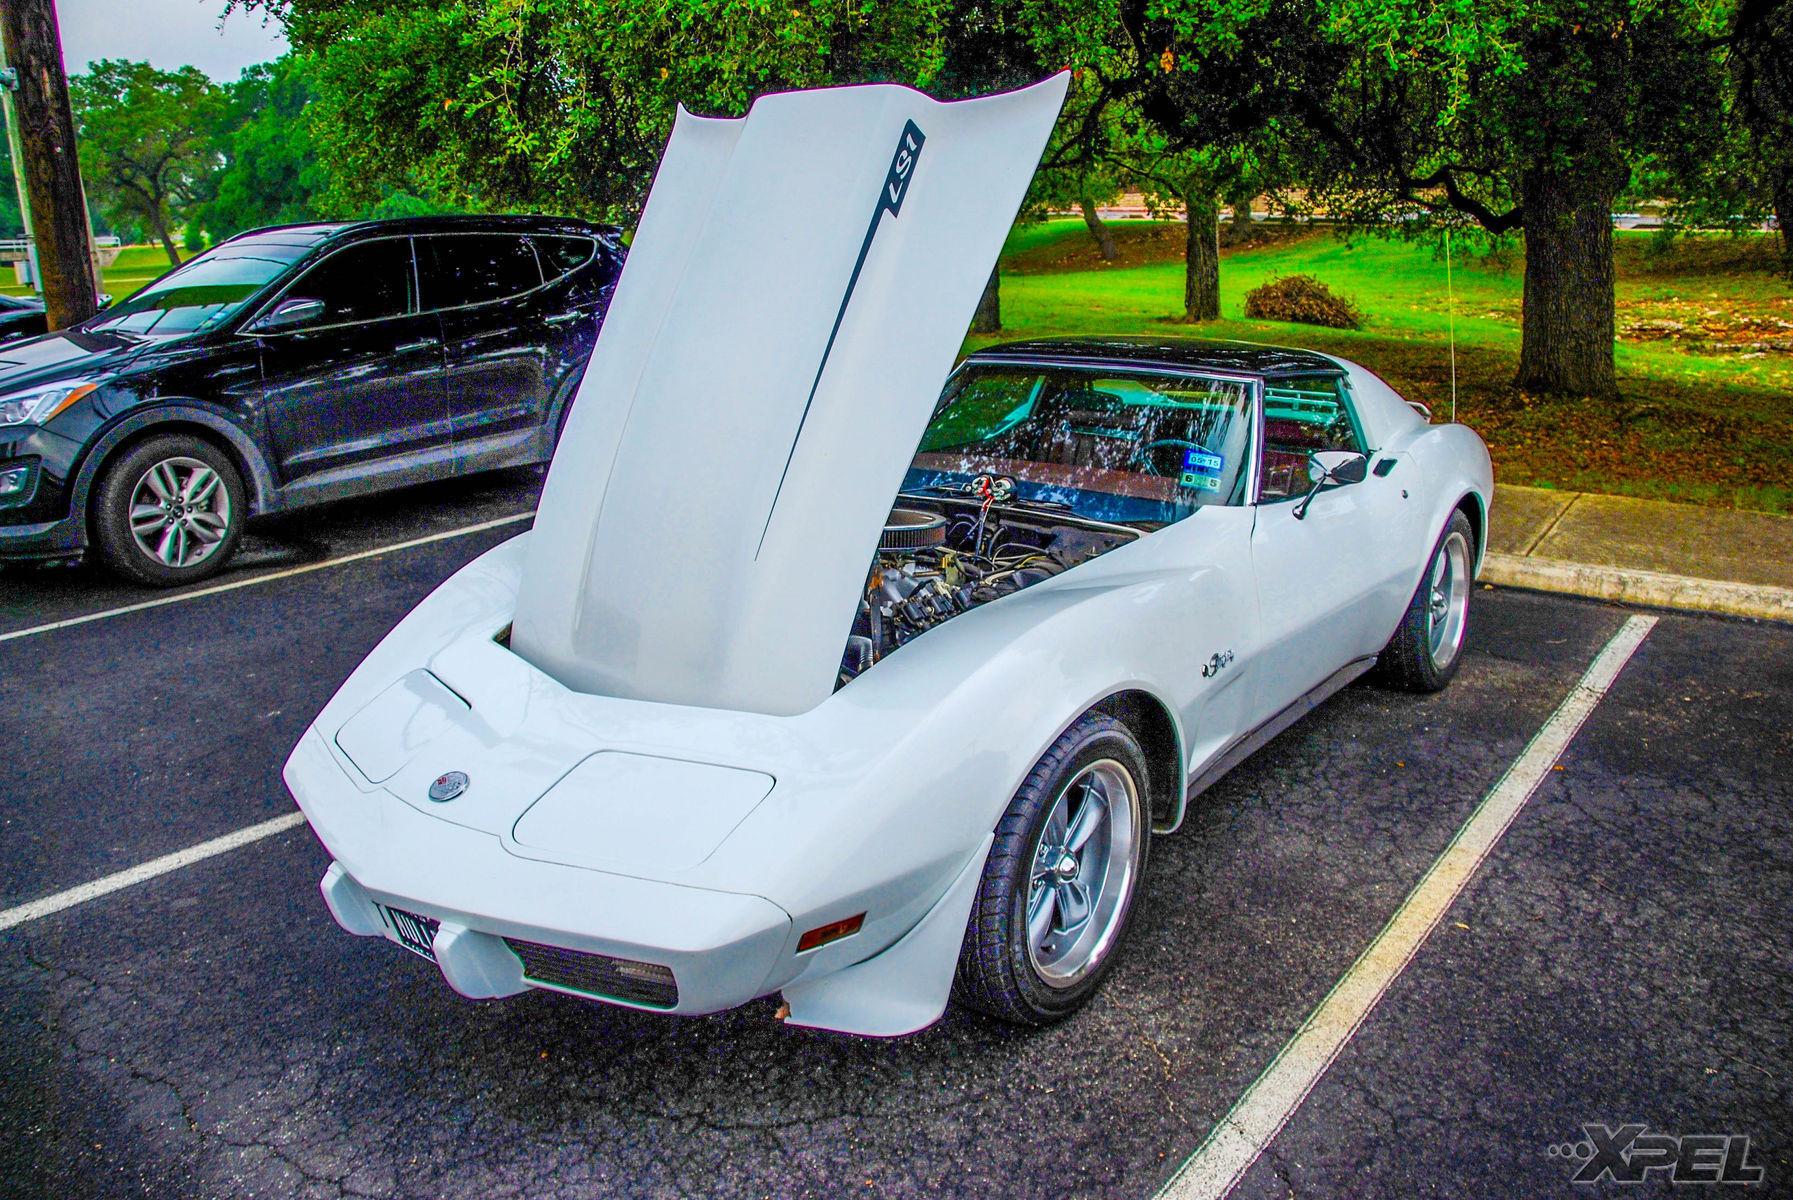 Chevrolet Corvette Stingray | Corvette Stingray at Cars and Coffee San Antonio